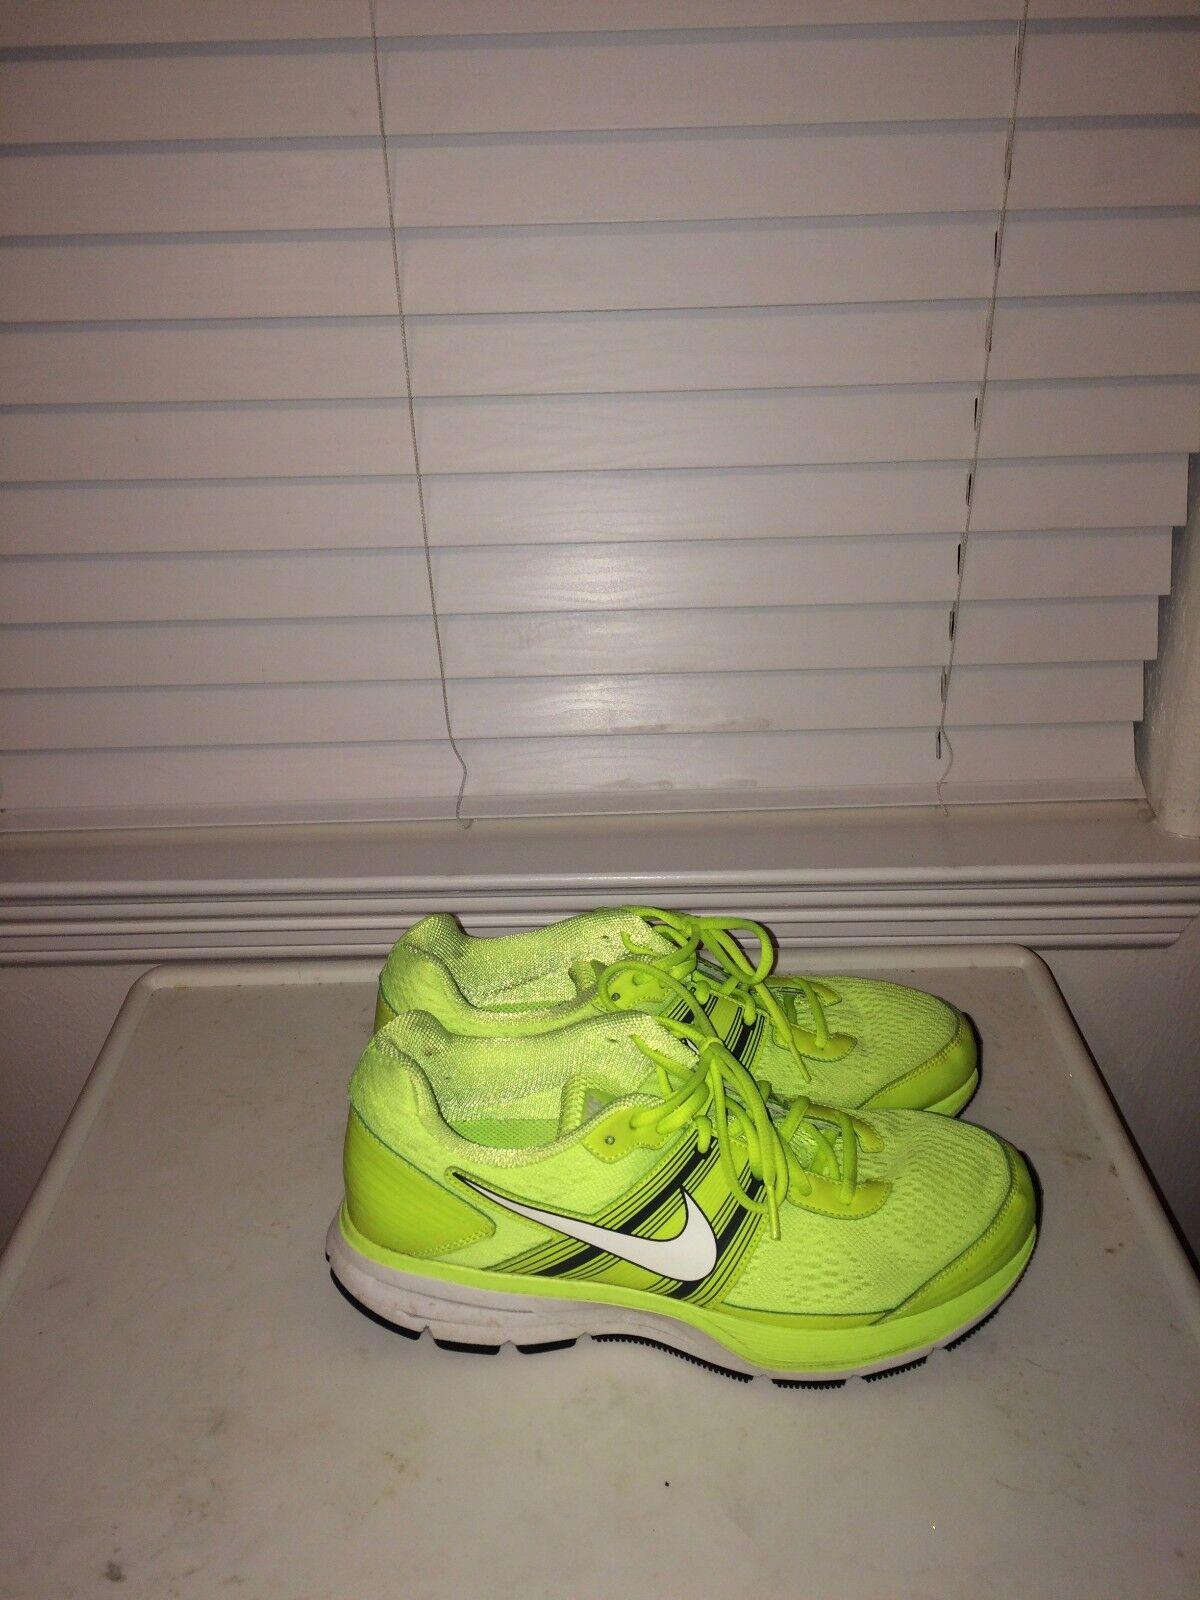 Nike Air Pegasus+ 29 Women's Running Shoes, size 11M – 2 Colors